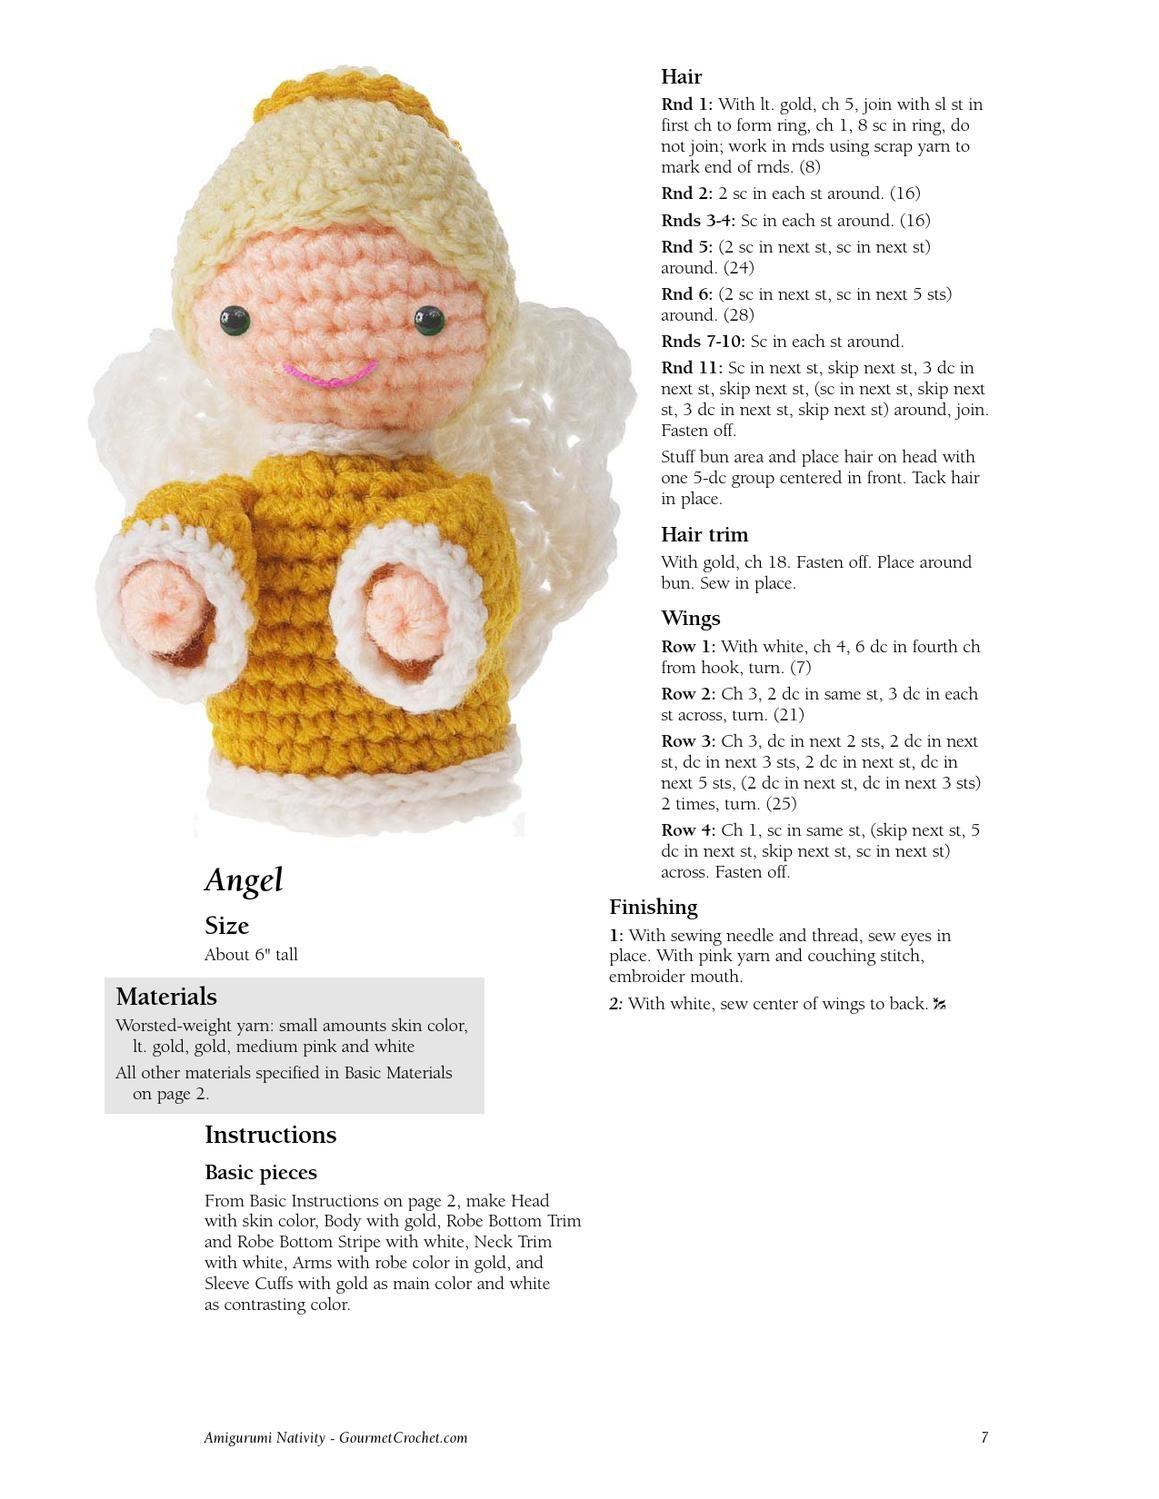 nacimiento crochet | angeli | Pinterest | Amigurumi, DIY Christmas ...